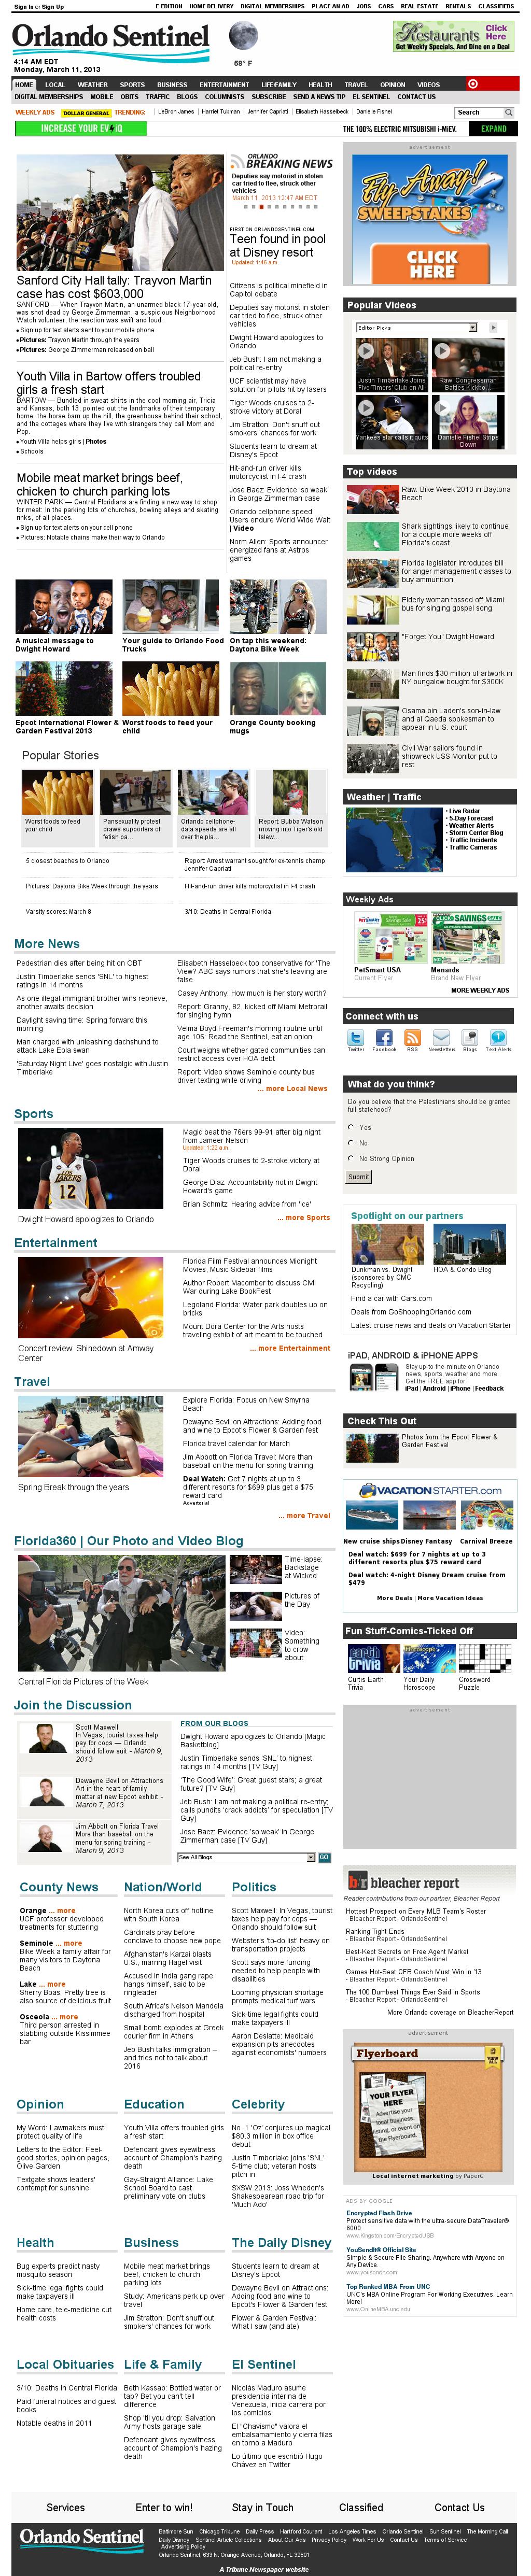 Orlando Sentinel at Monday March 11, 2013, 8:14 a.m. UTC